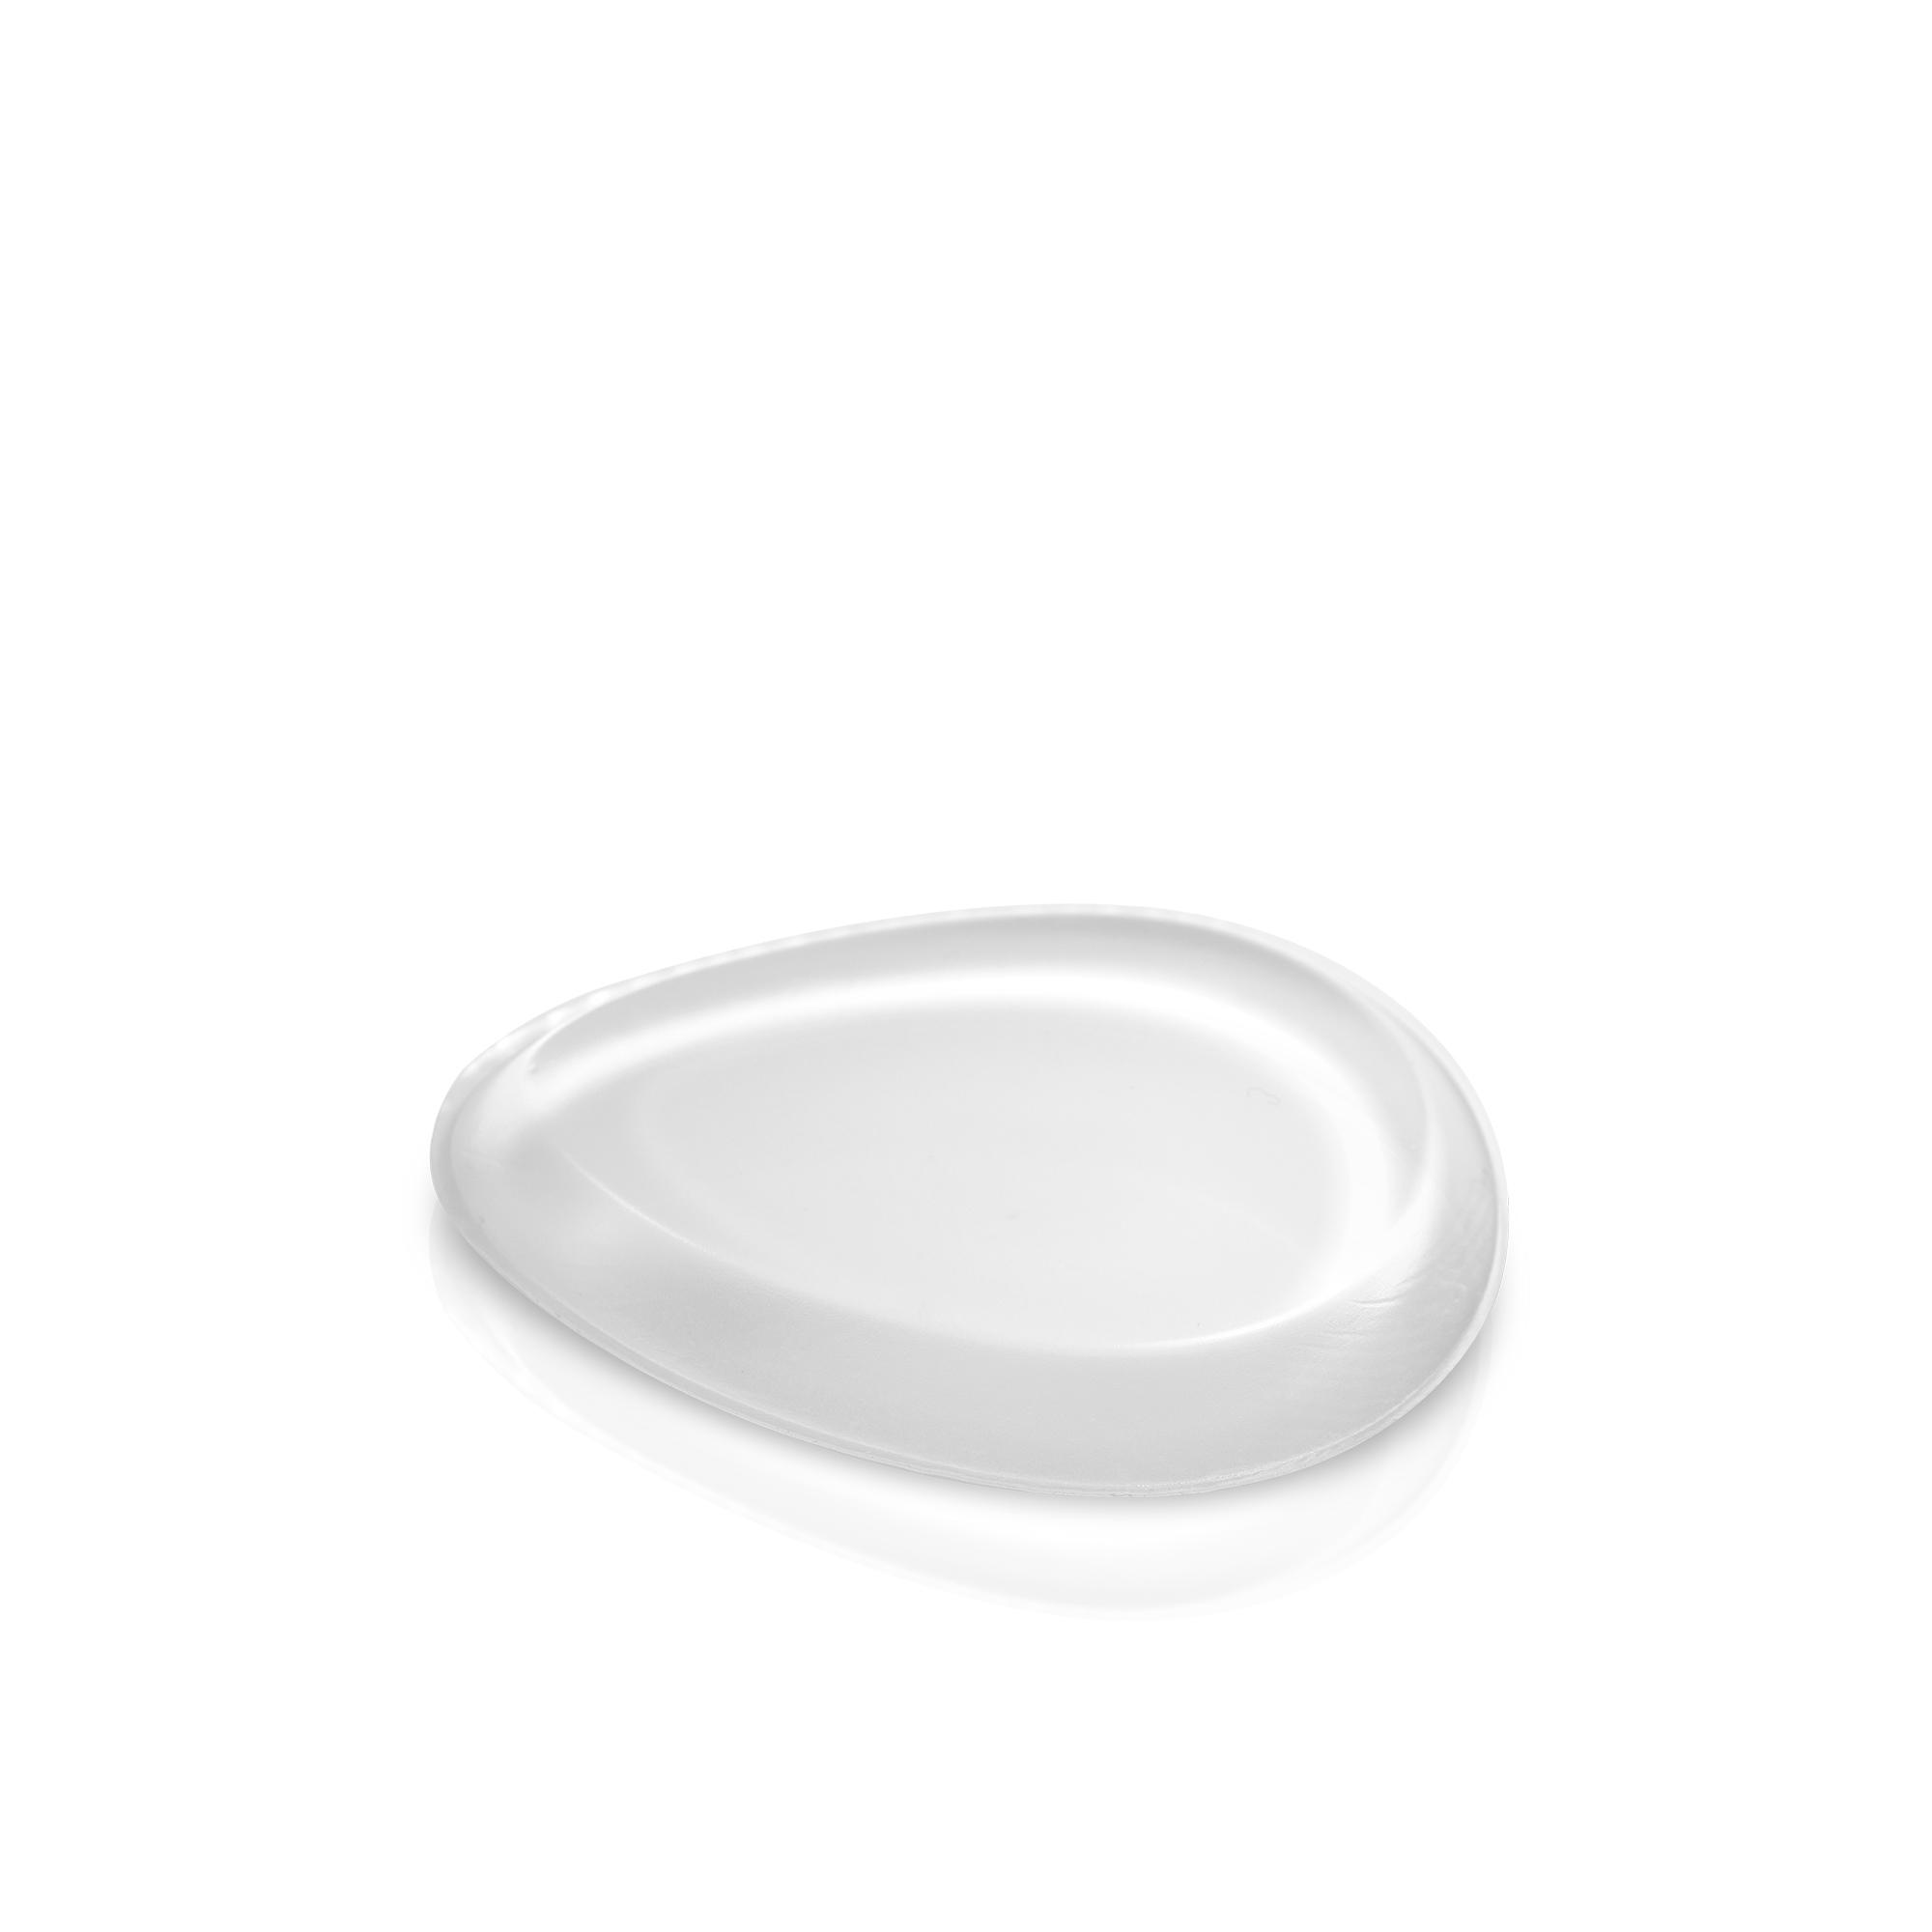 Esponja silicona de maquillaje